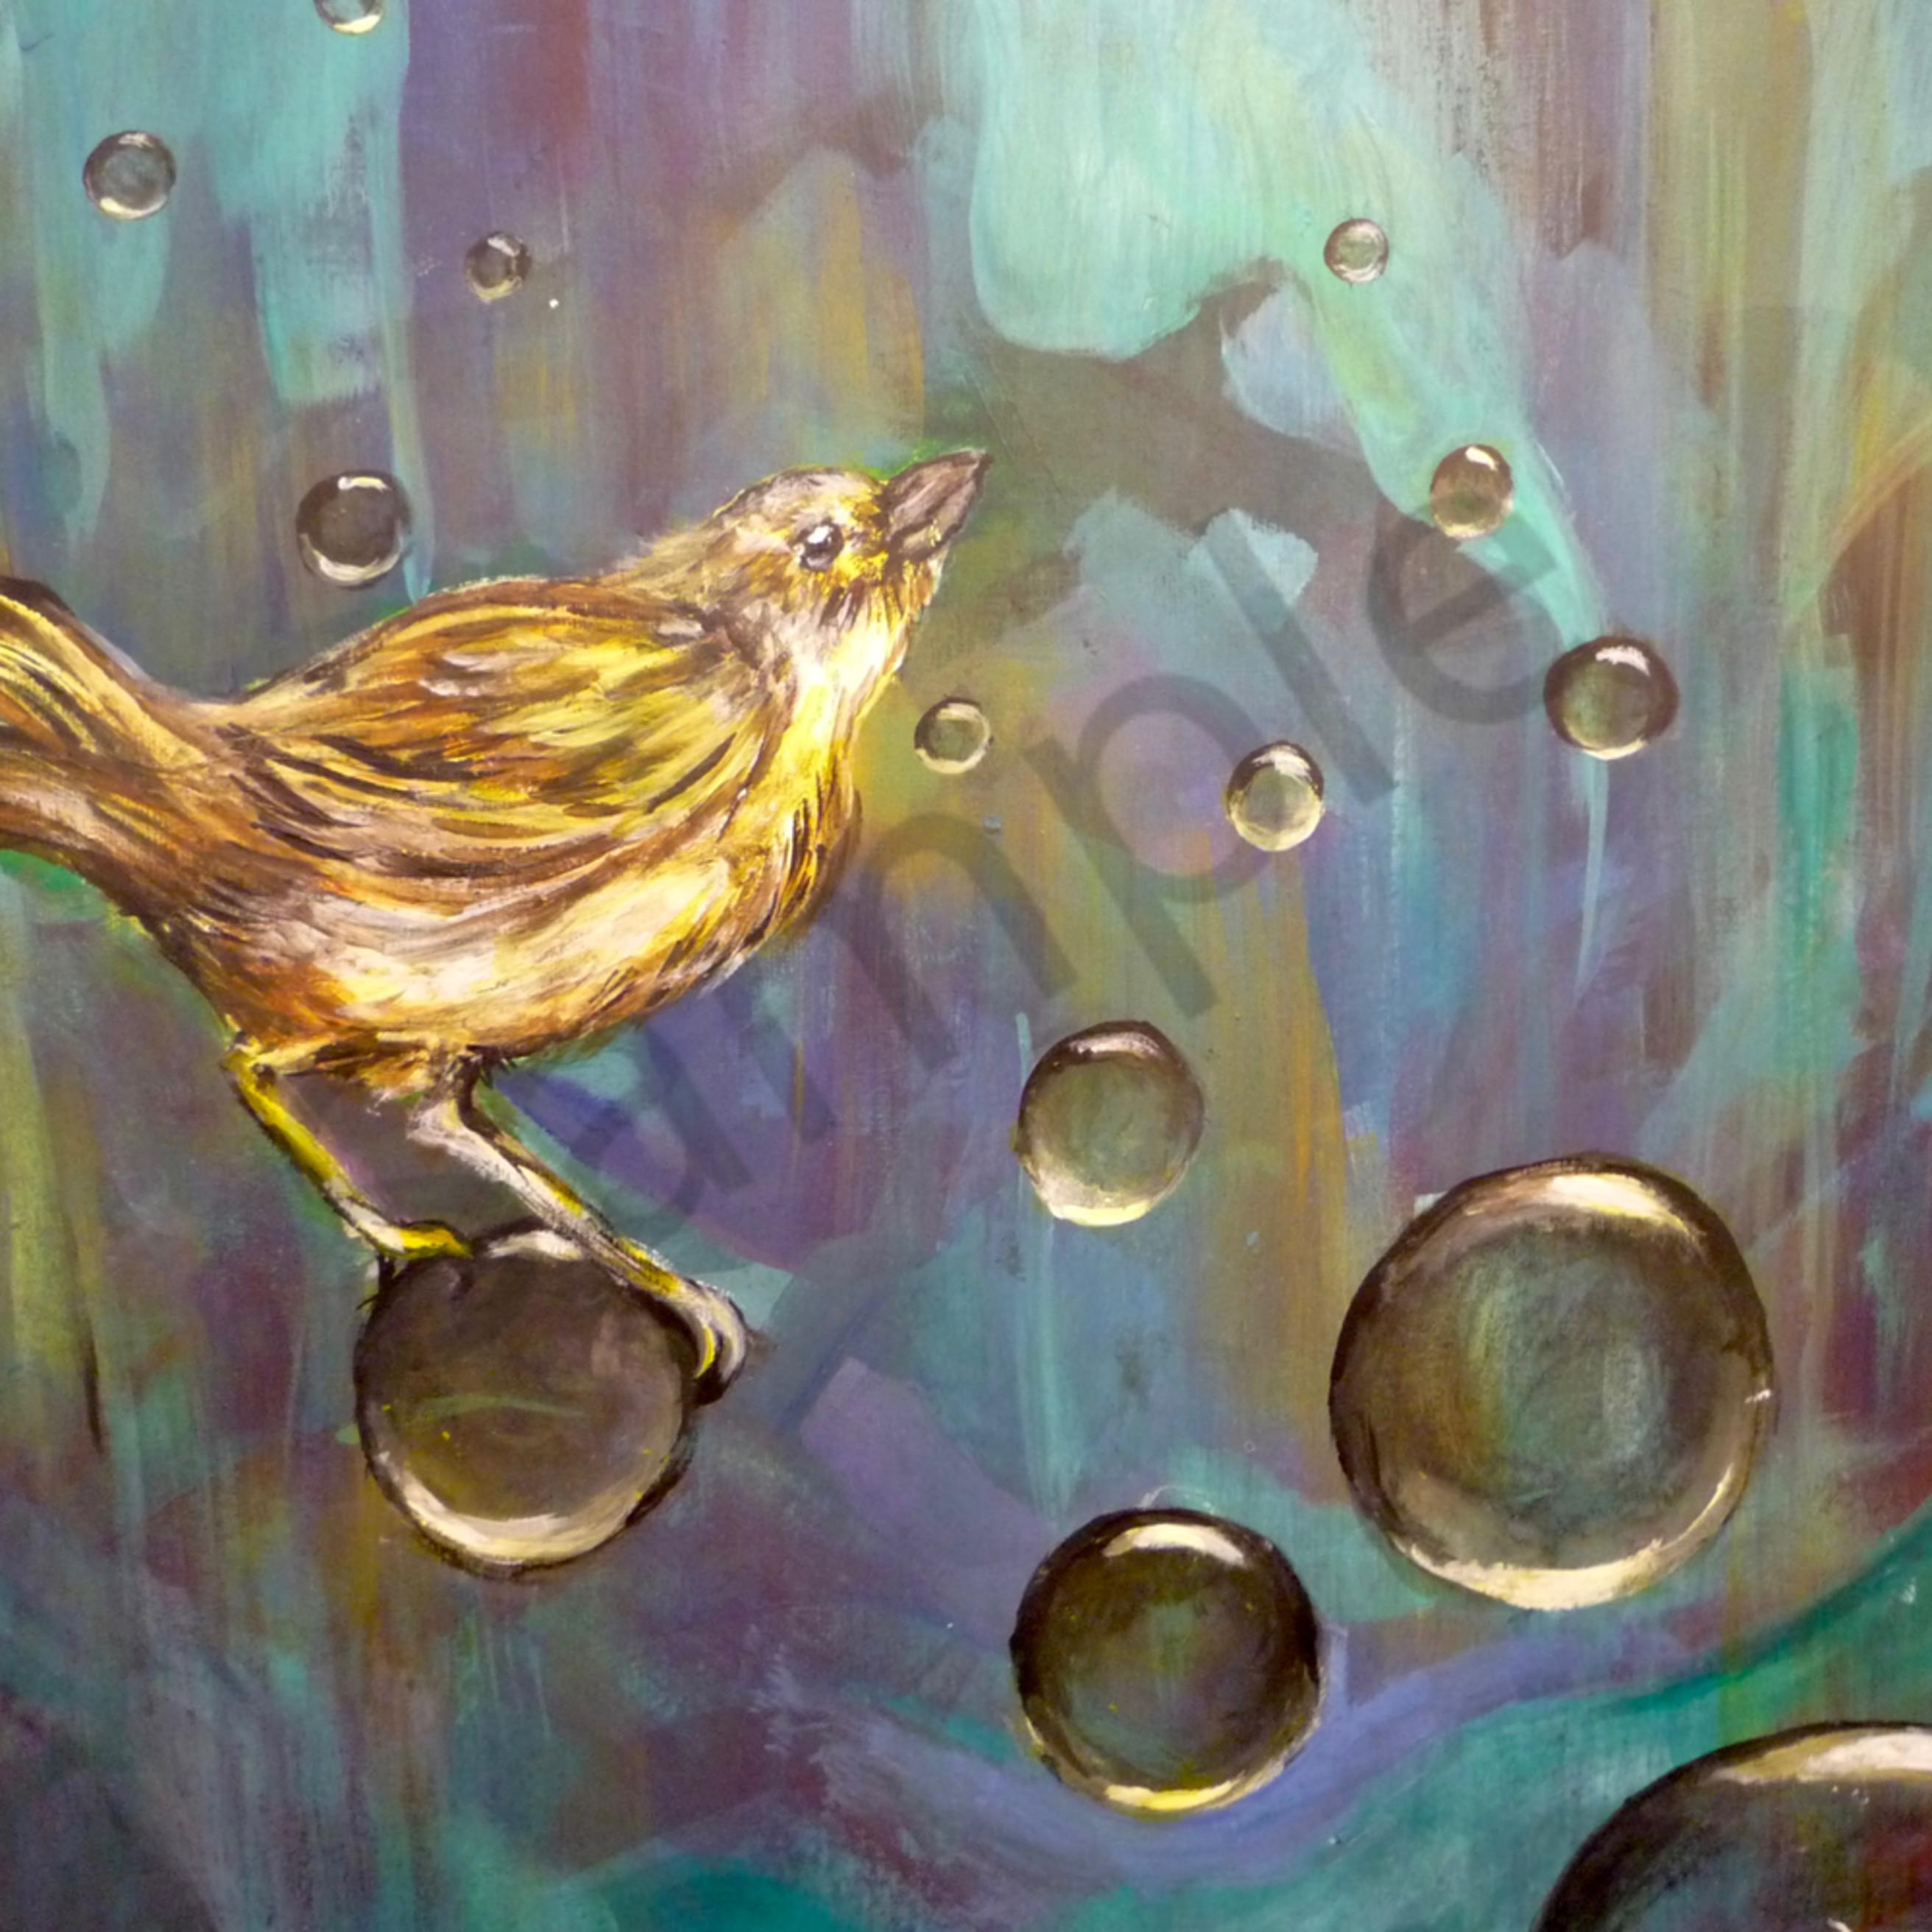 Bernie s peace bird p4cc3i